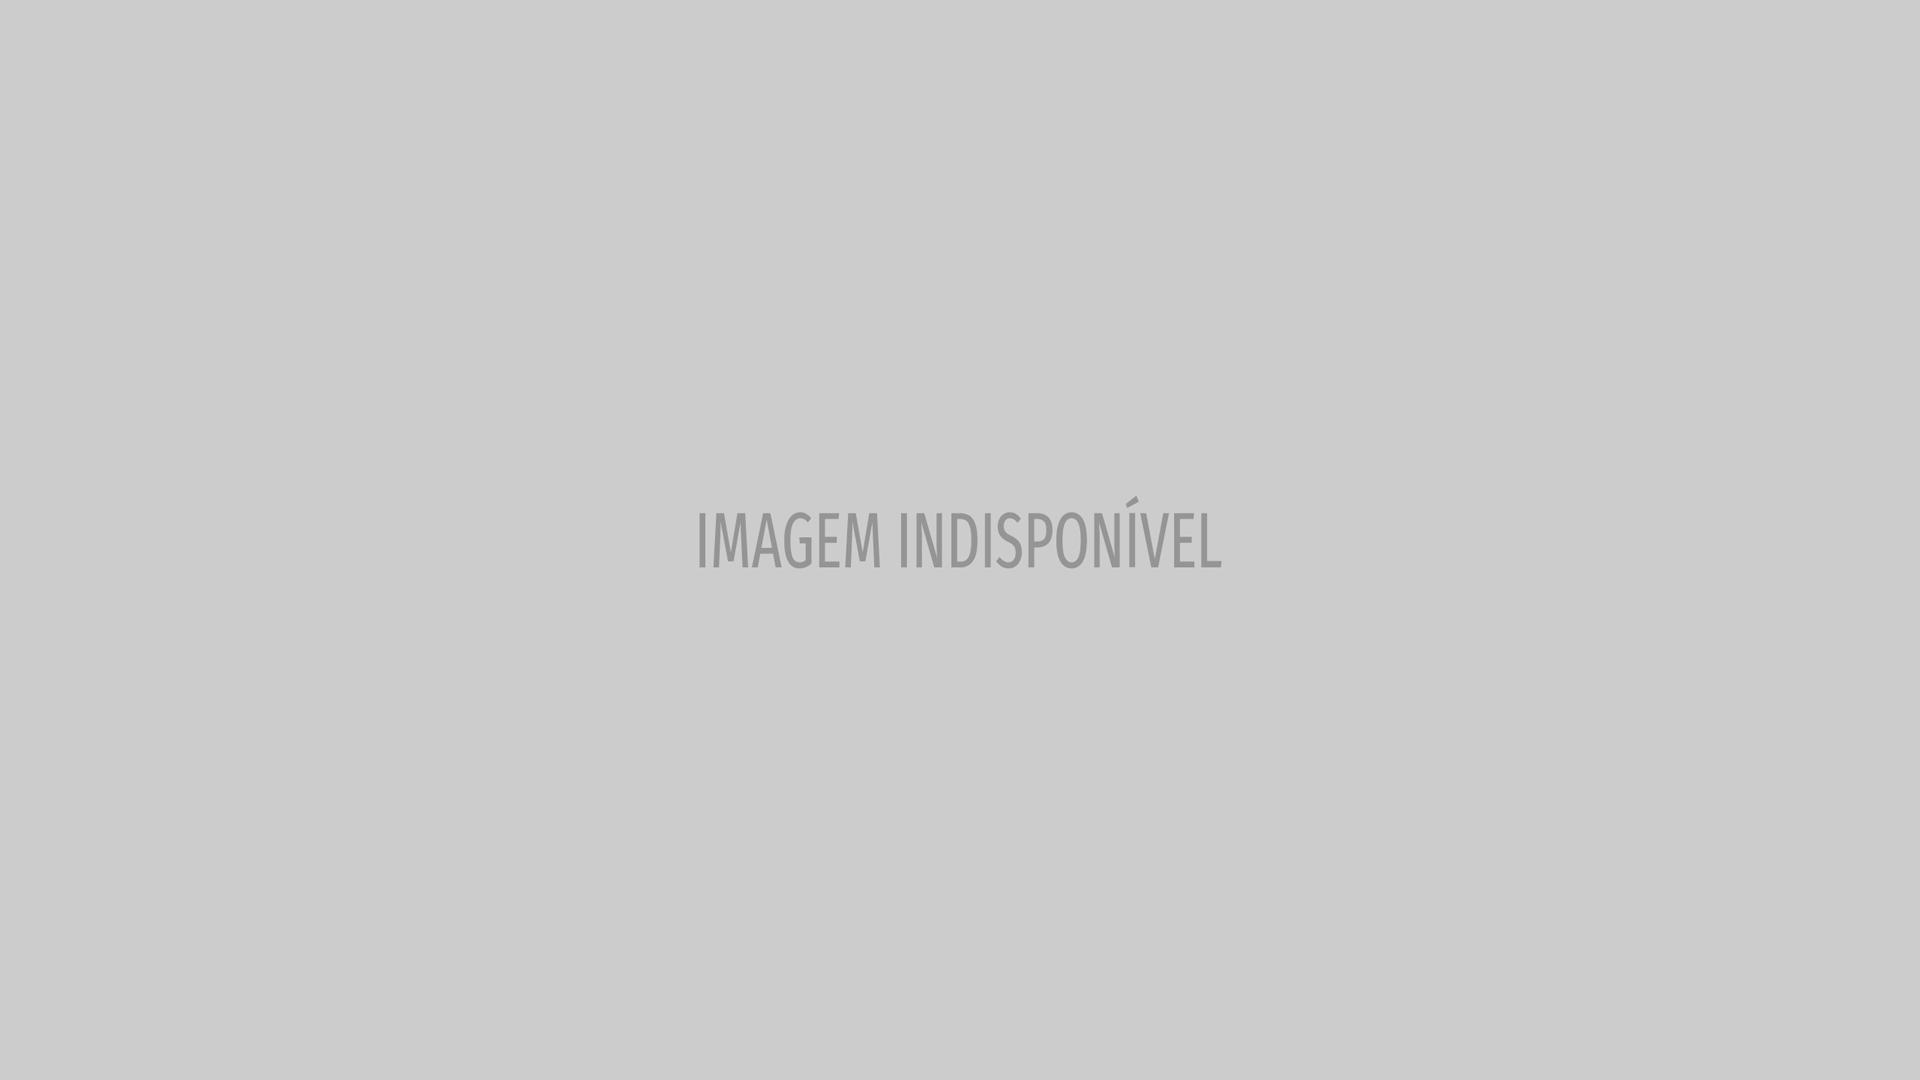 Gracyanne dança novo hit da Banda Vingadora: 'Bumbum de martelo'